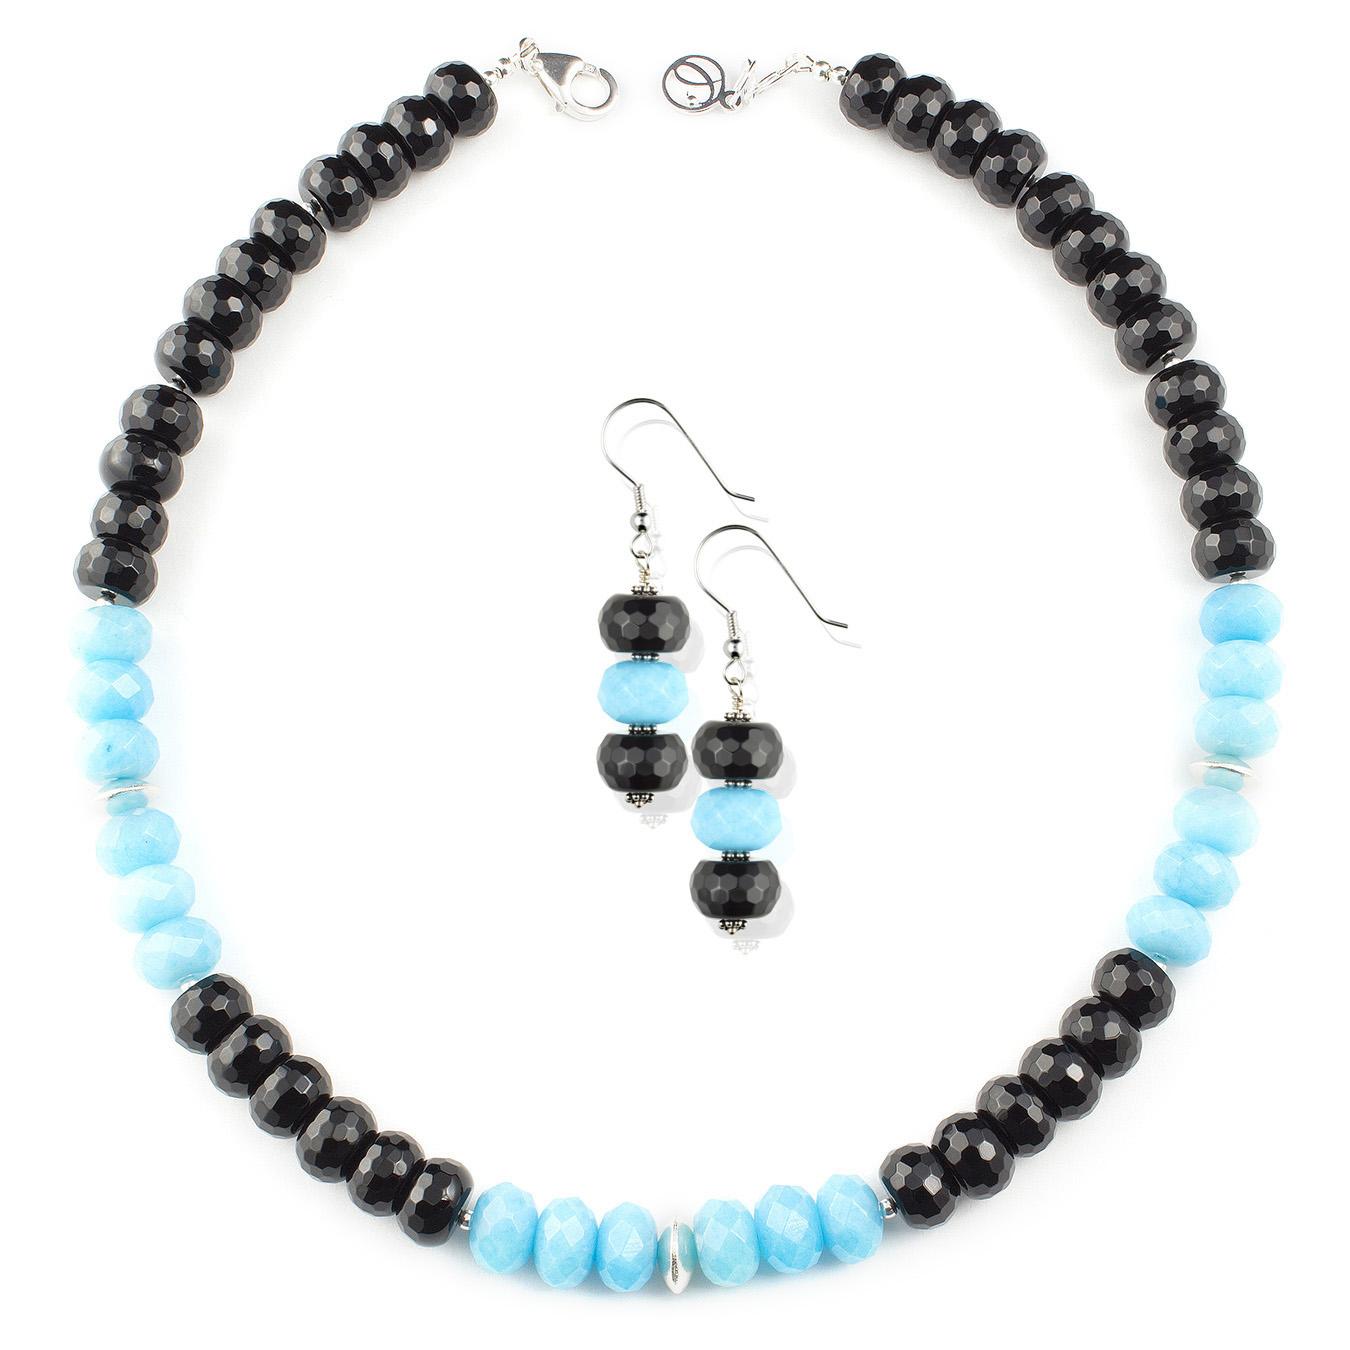 Custom necklace made with using black, pink and orange jade gemstones